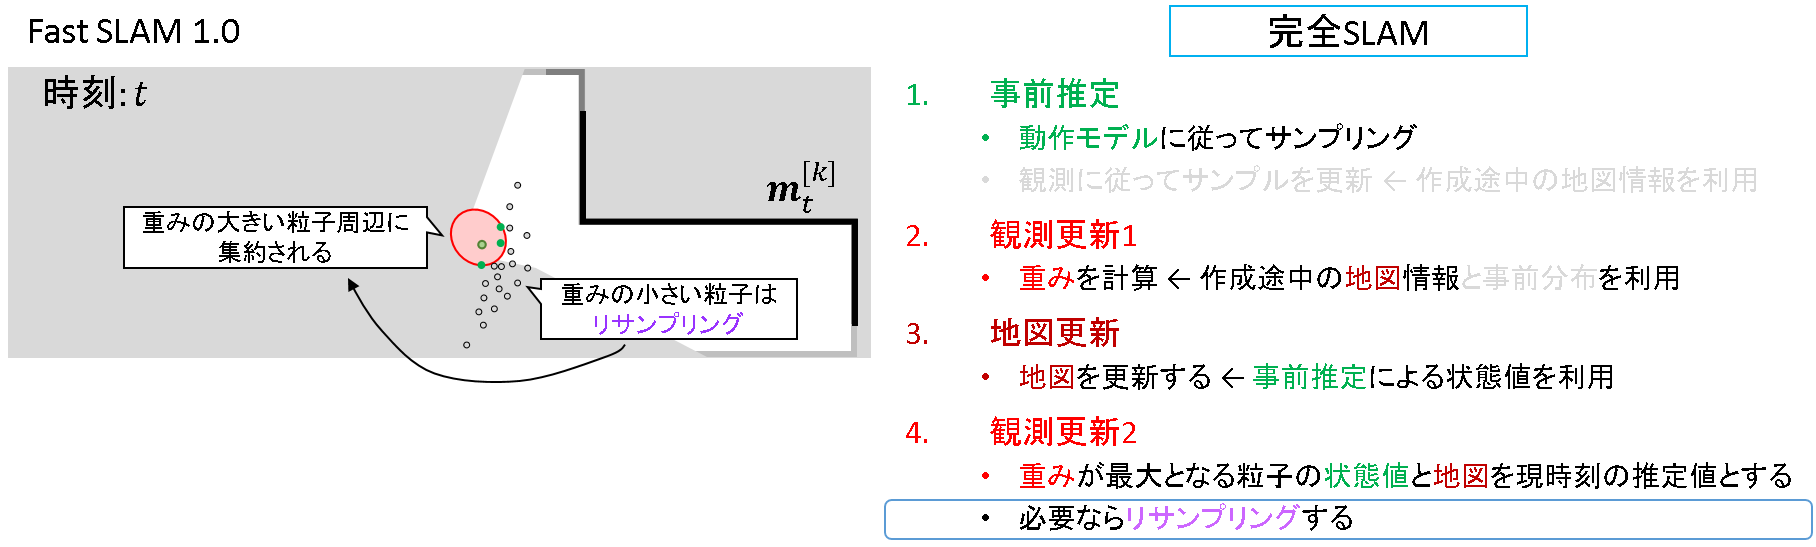 76_FastSLAM1.0_観測更新2_2.png